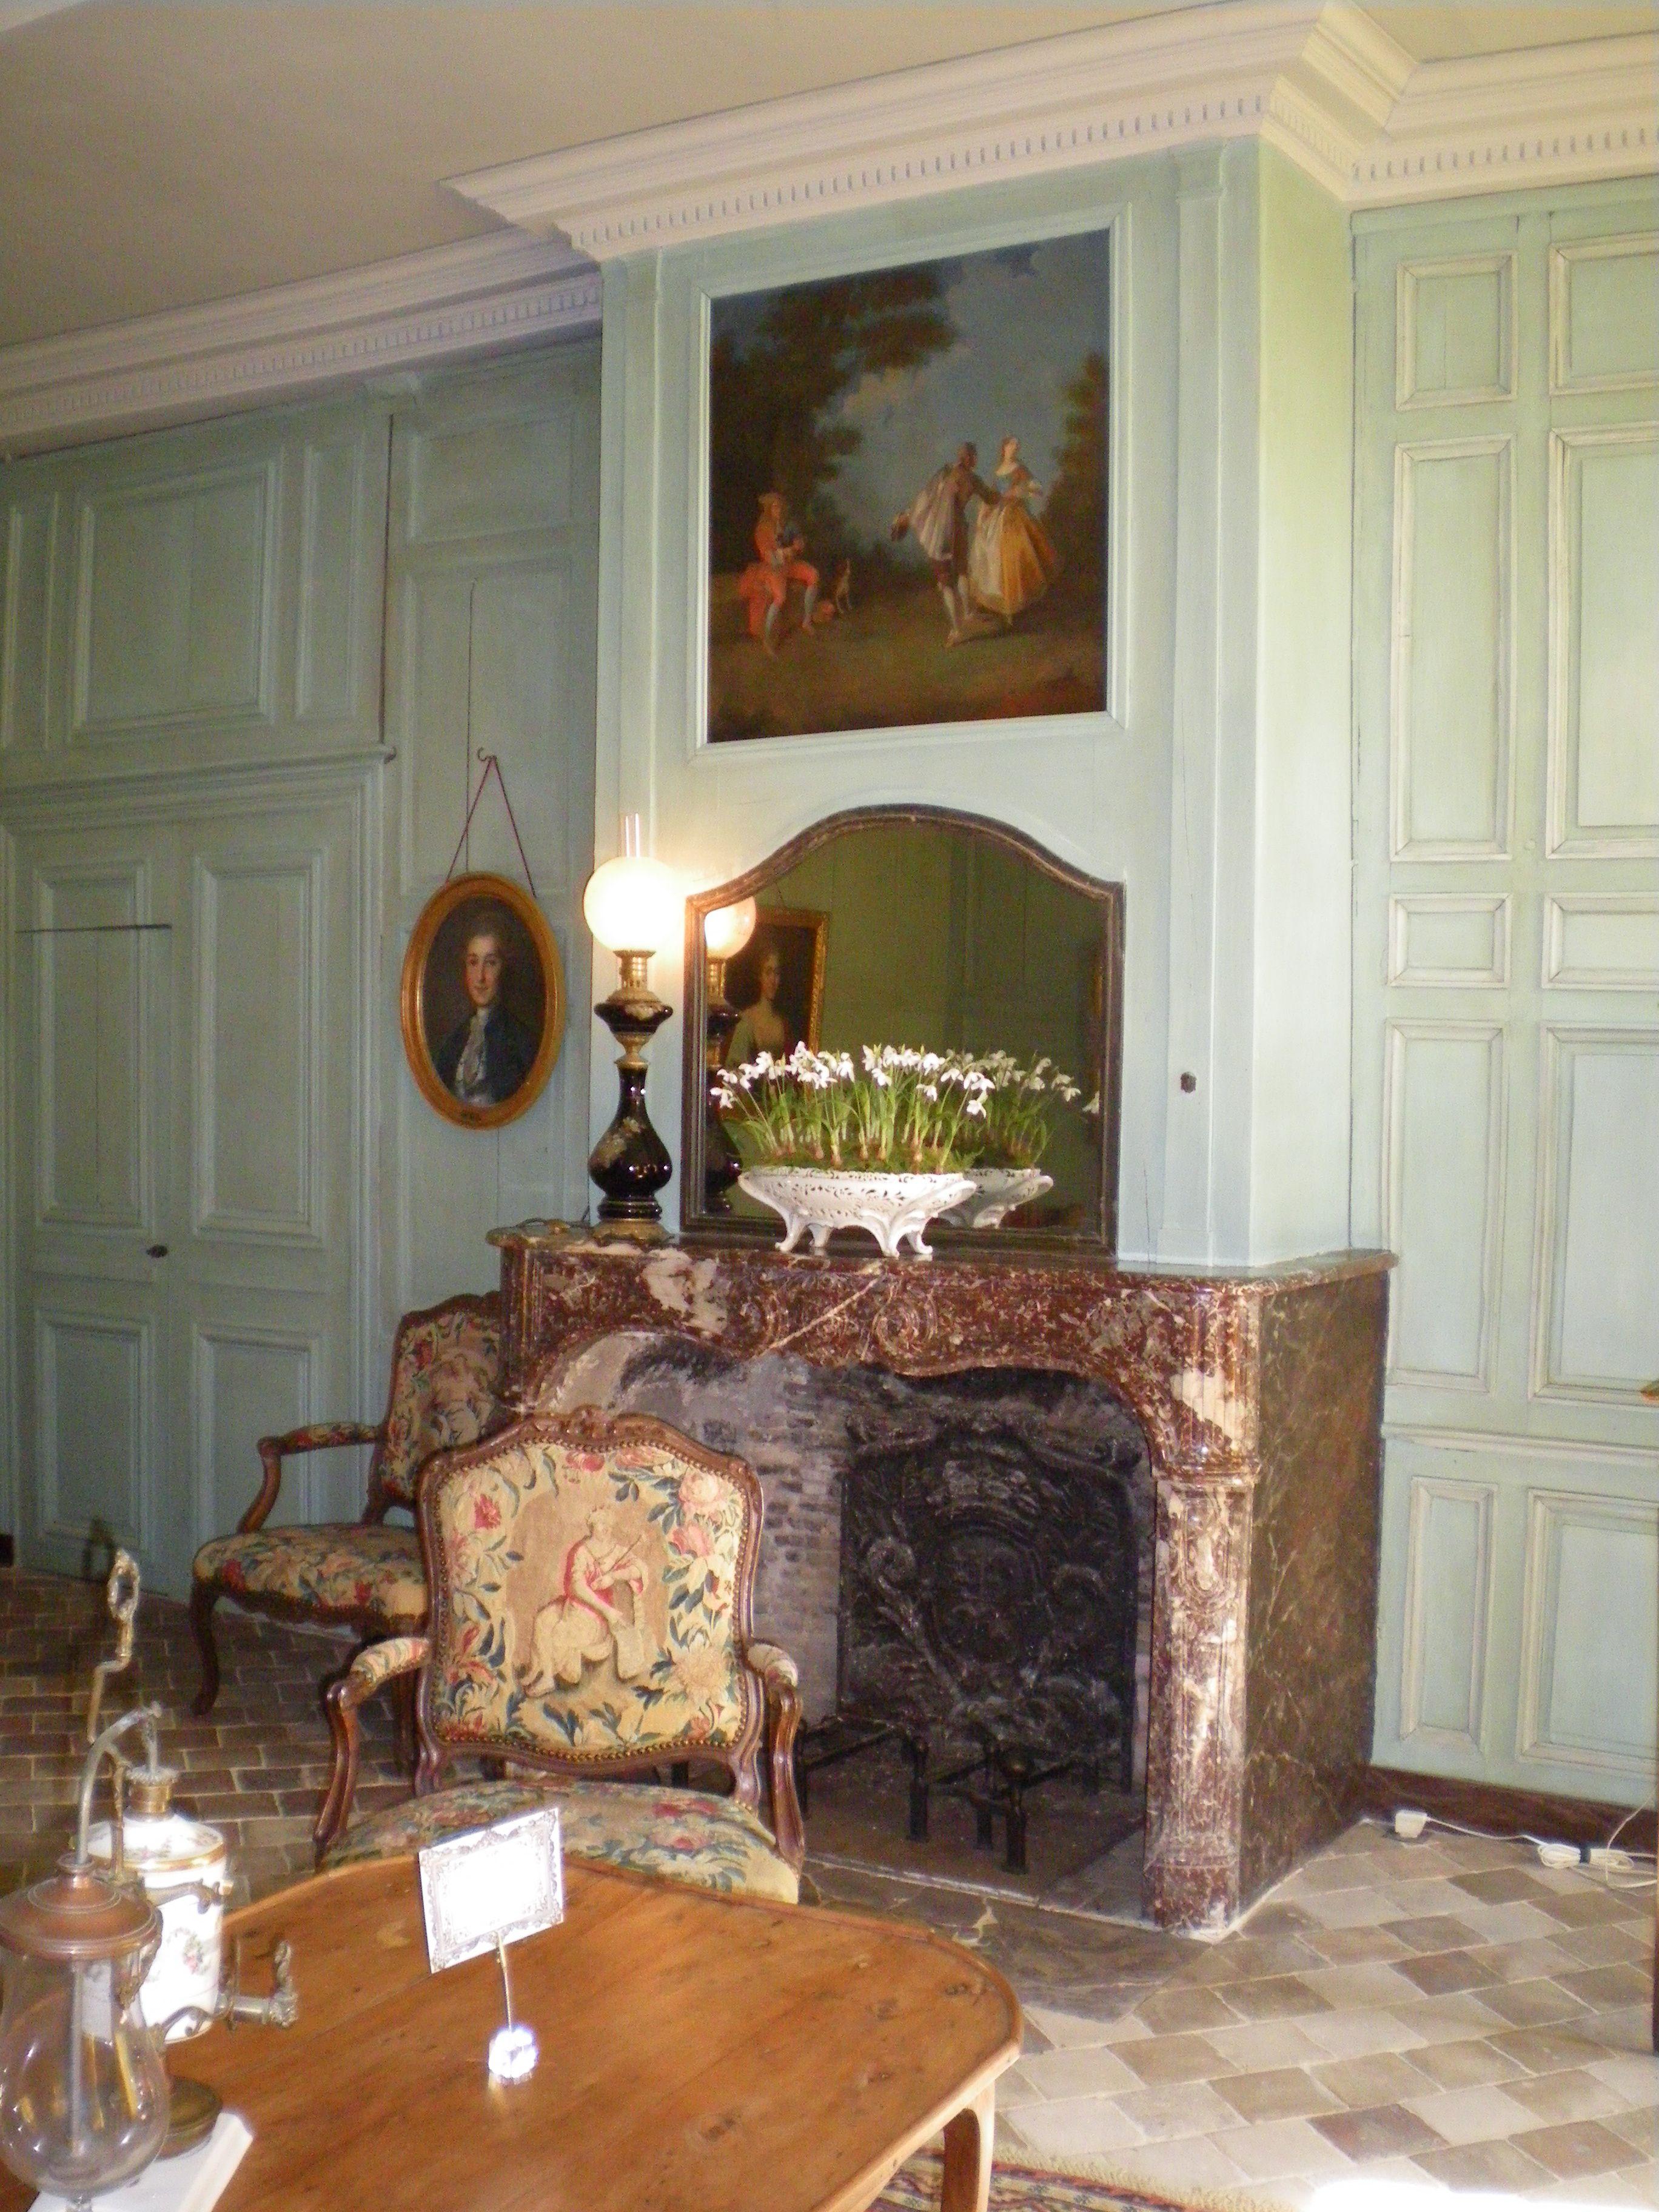 Pin by Pascale laville on Talcy château de Pinterest